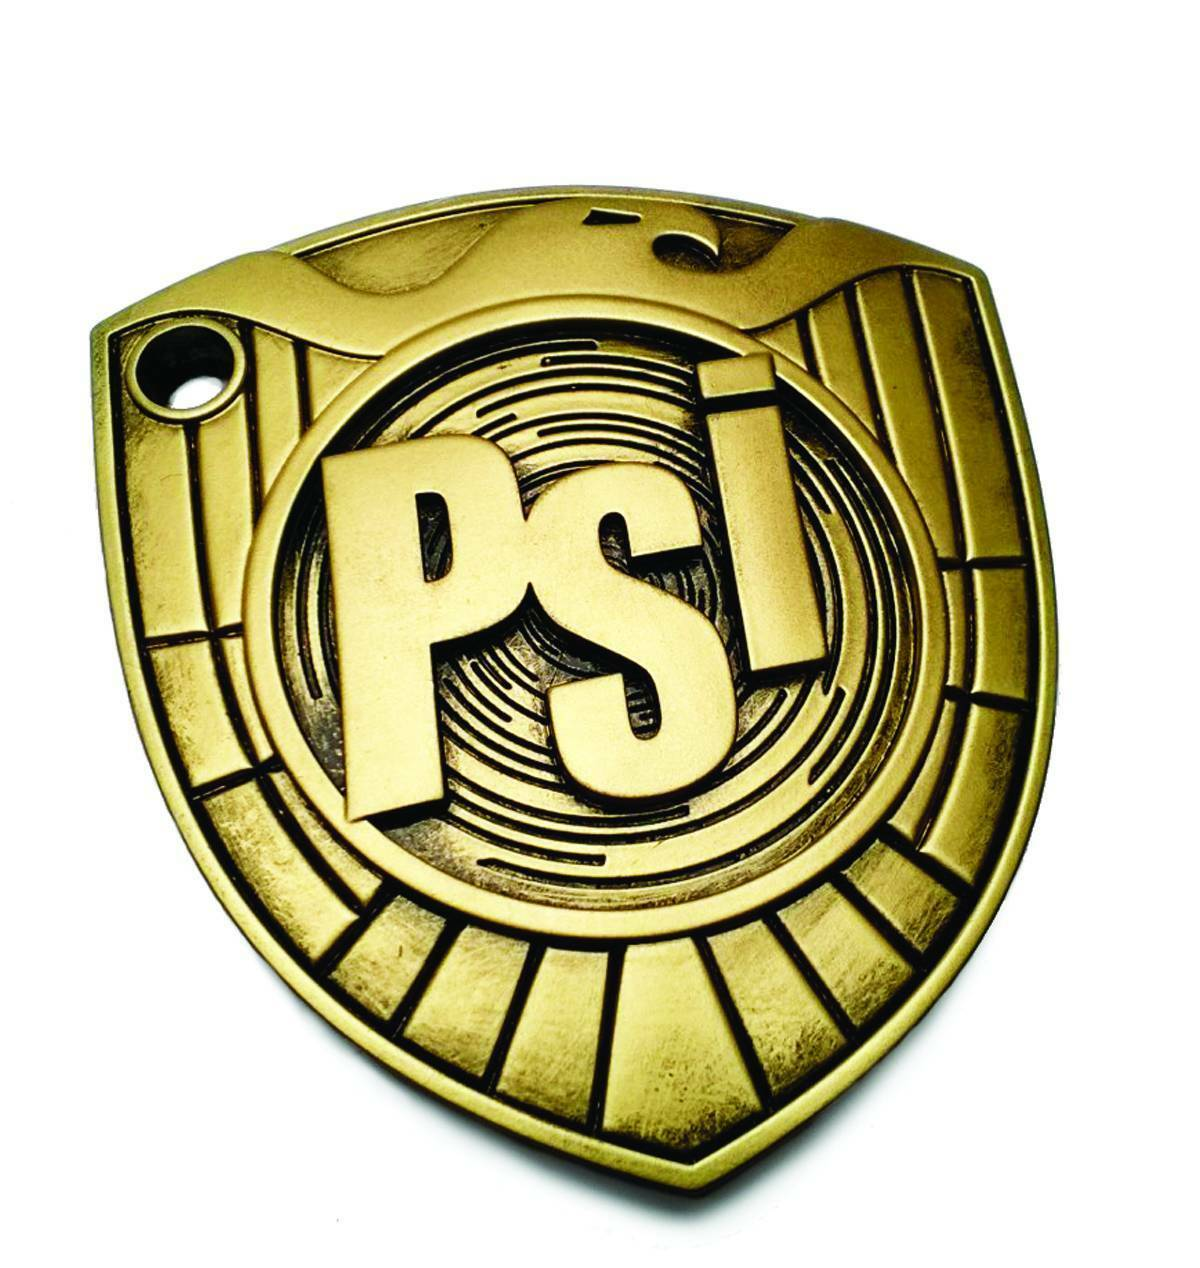 Judge Dredd PSI Division Badge 1 1 Prop Planet Replicas